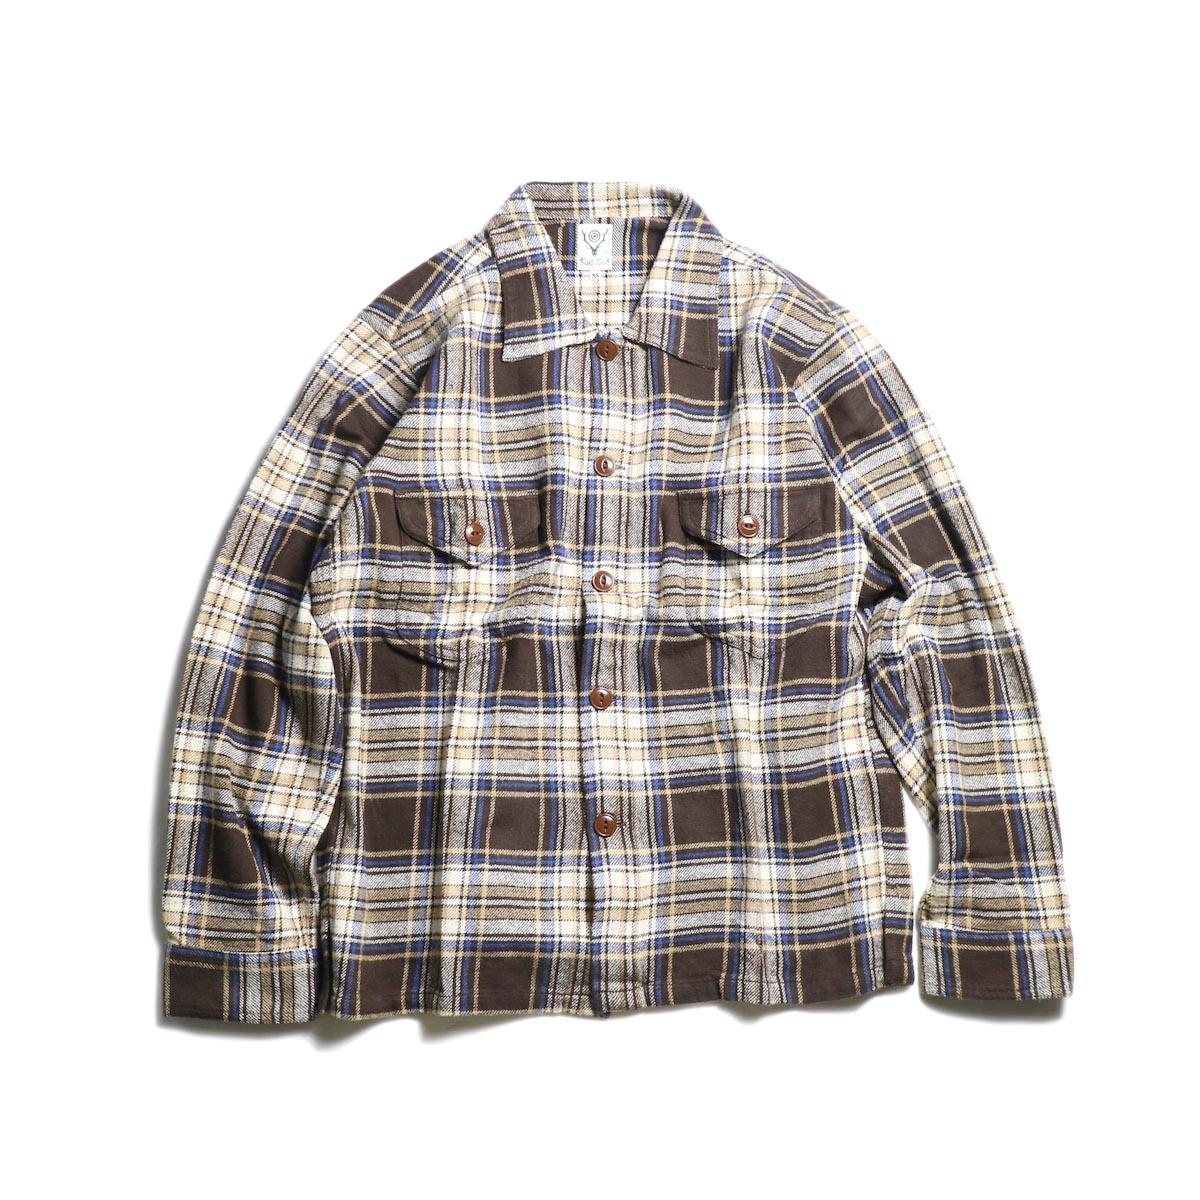 SOUTH2 WEST8 / Smokey Shirt - Cotton Twill / Plaid (brown)